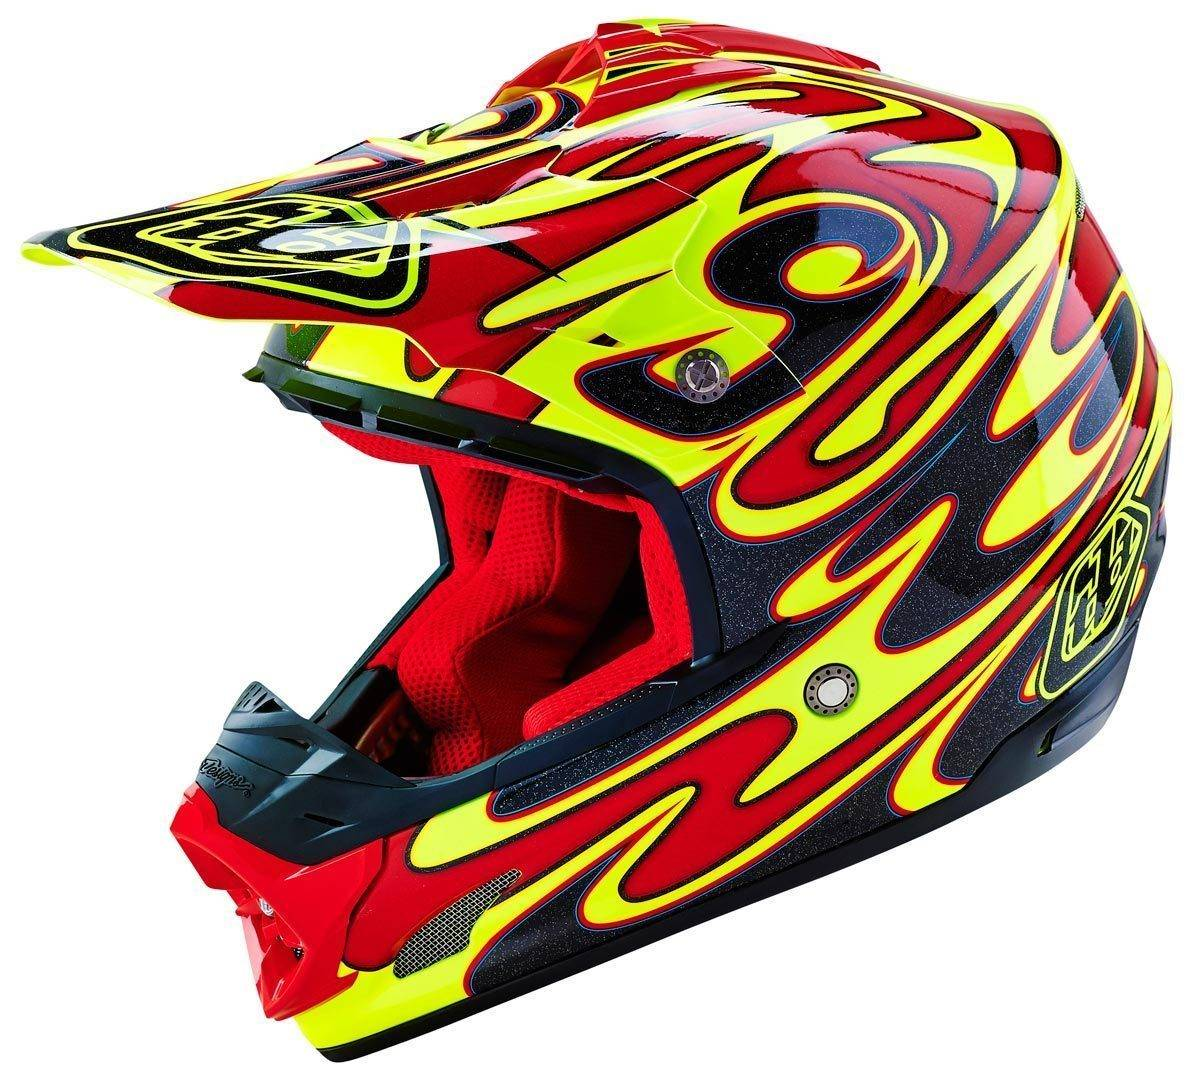 Lee Troy Lee Designs SE3 Reflection Motocross Helmet  - Size: Small